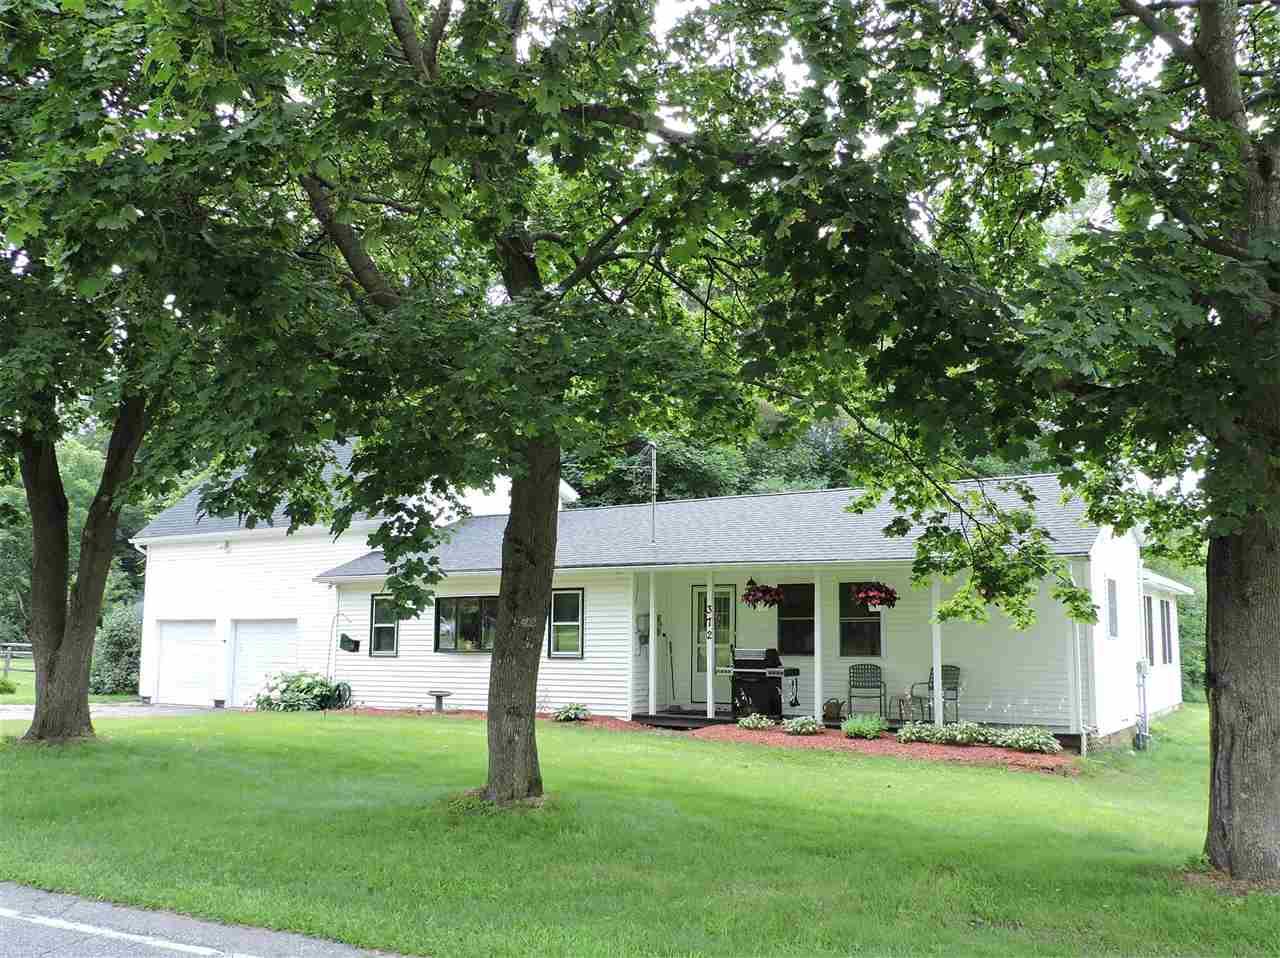 372 Bean Road, Colchester, VT 05446